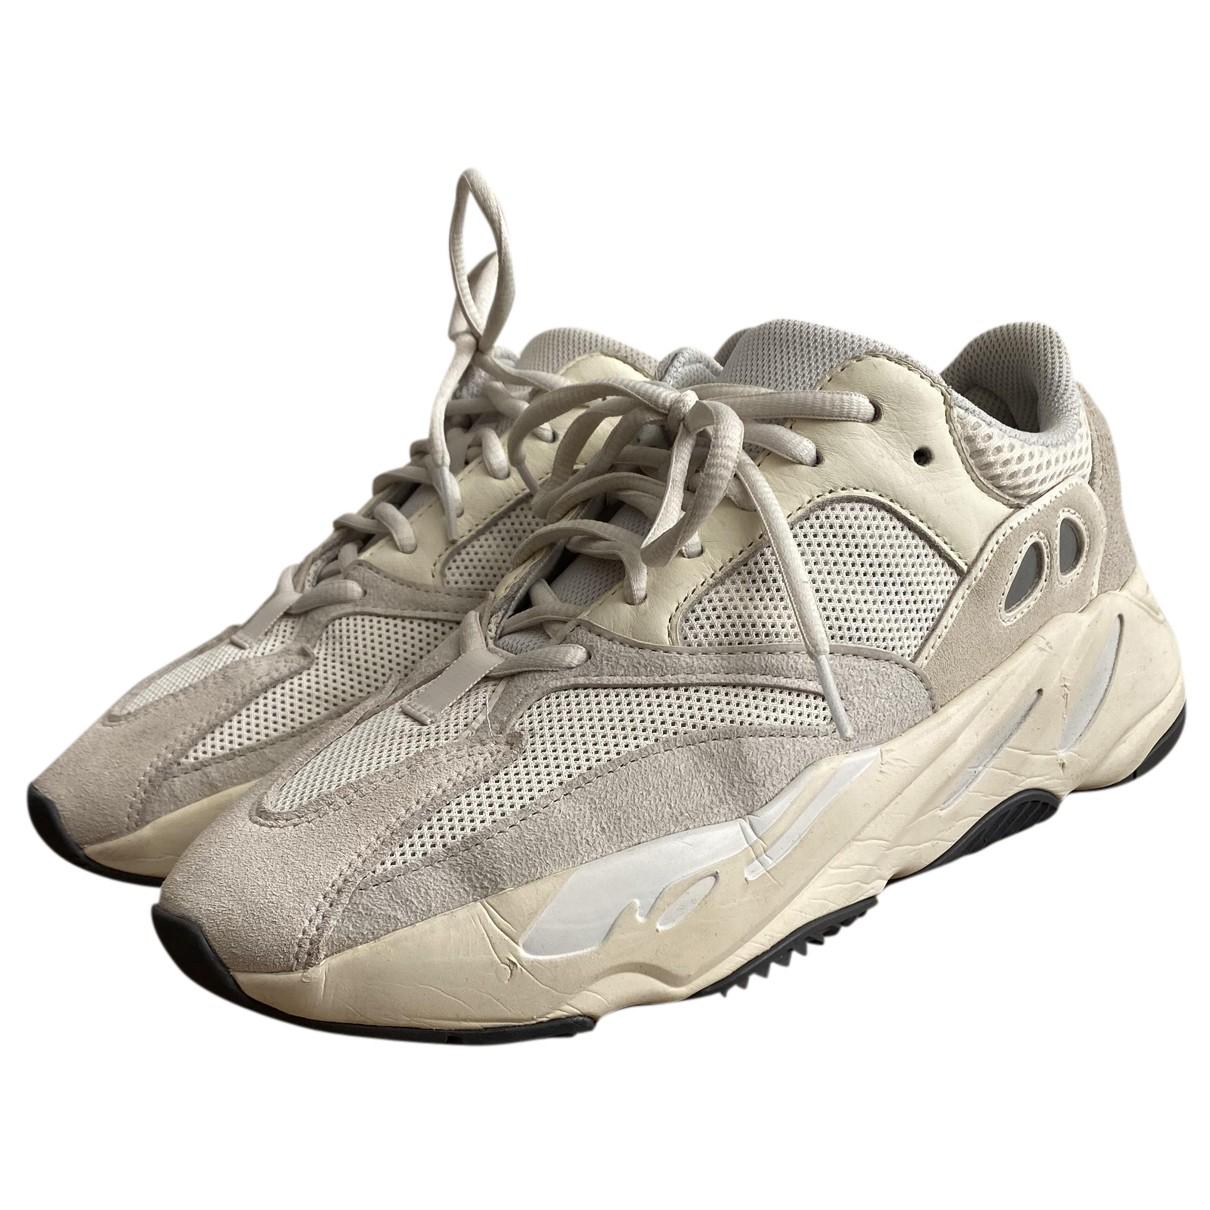 Yeezy X Adidas - Baskets Boost 700 V1  pour homme en toile - beige